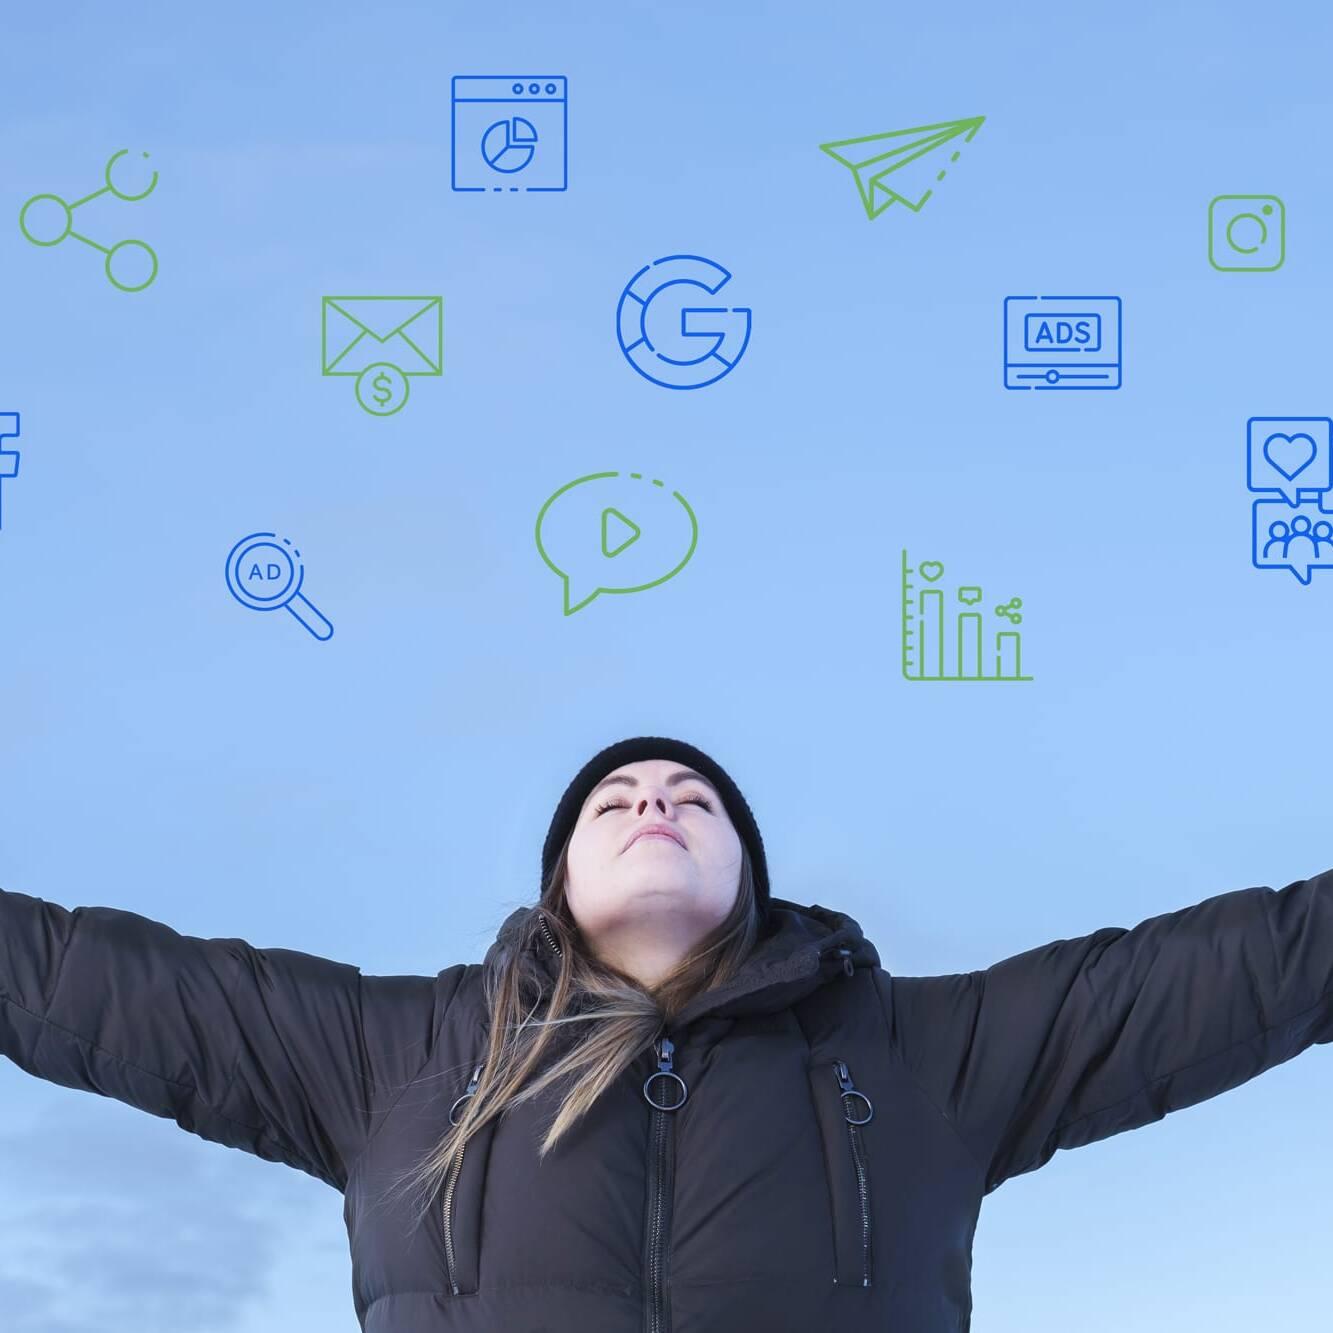 Digital markedsføring. Ren Røros Frontal